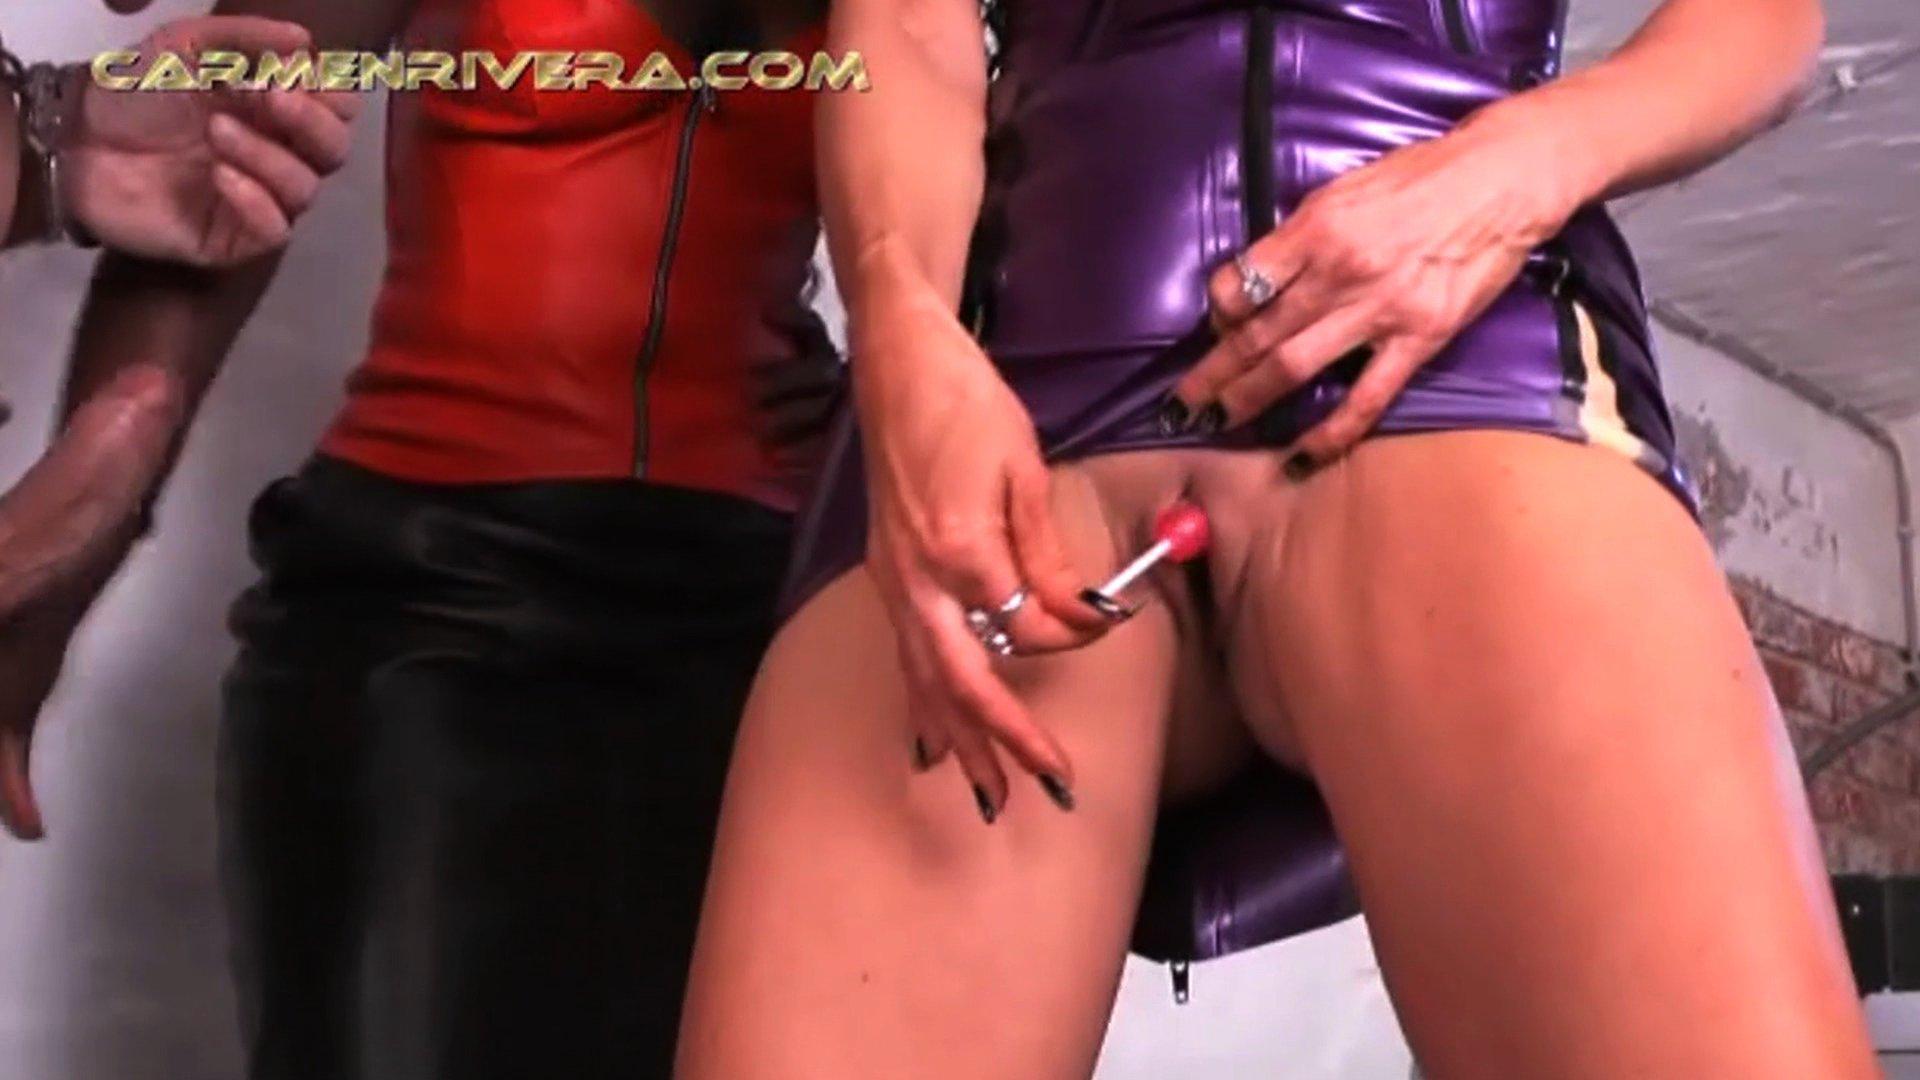 Photo number 6 from Bunga Bunga shot for Carmen Rivera on Kink.com. Featuring  in hardcore BDSM & Fetish porn.